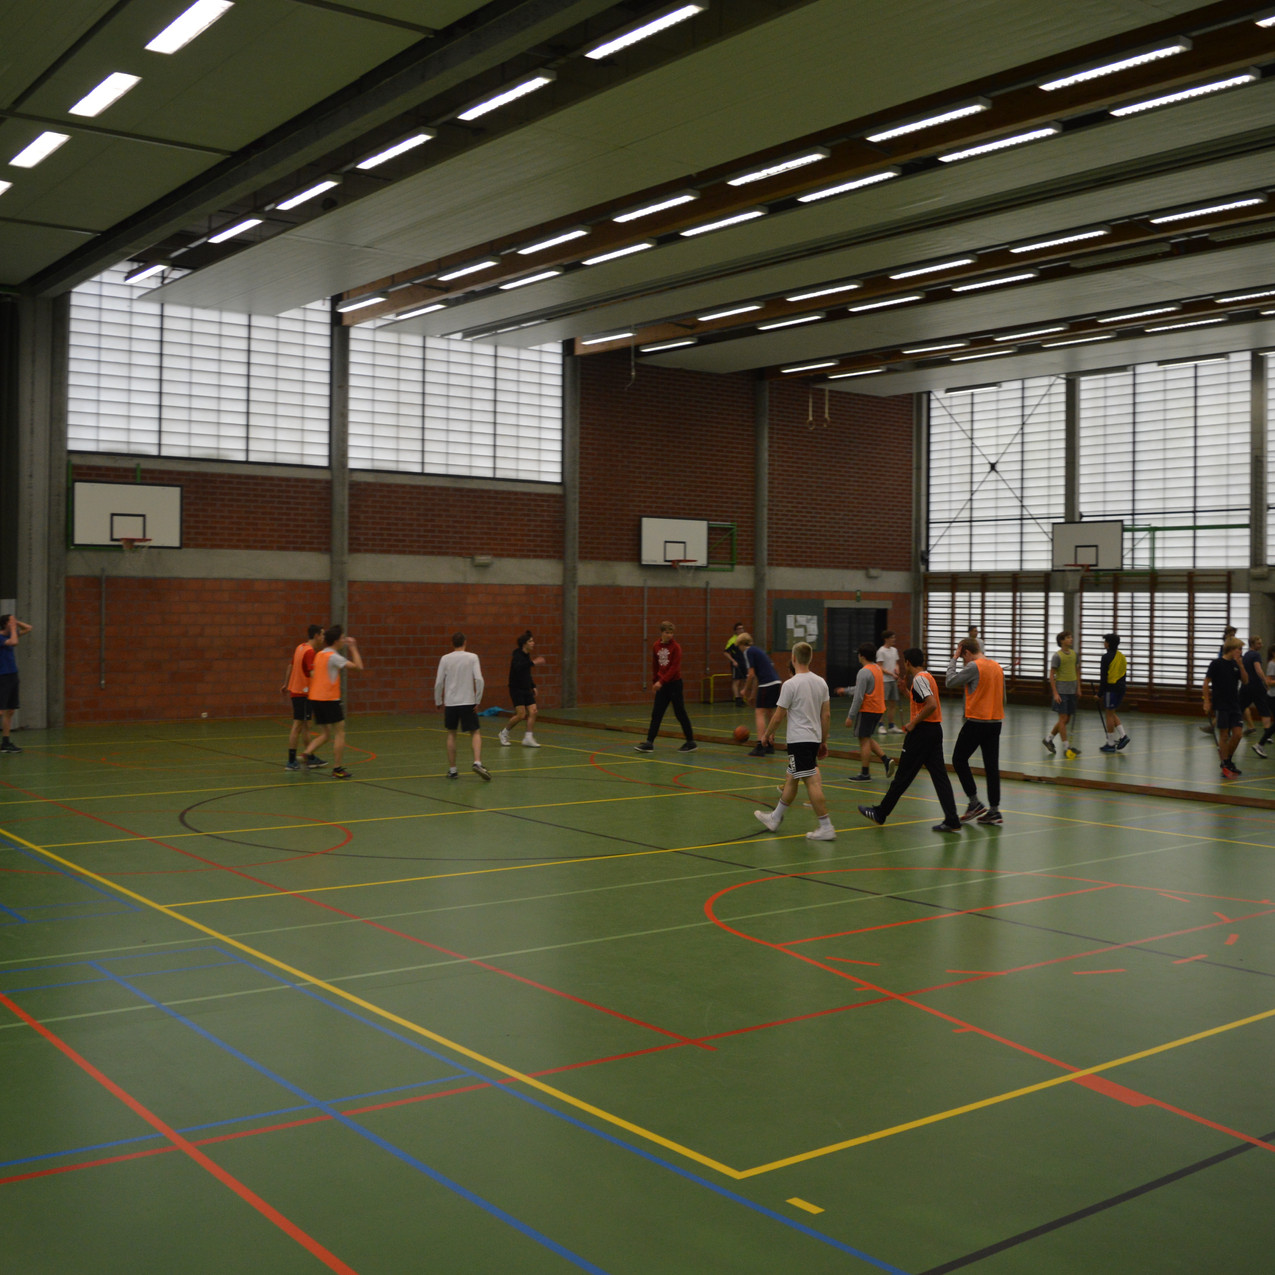 20171207 examensport (3)